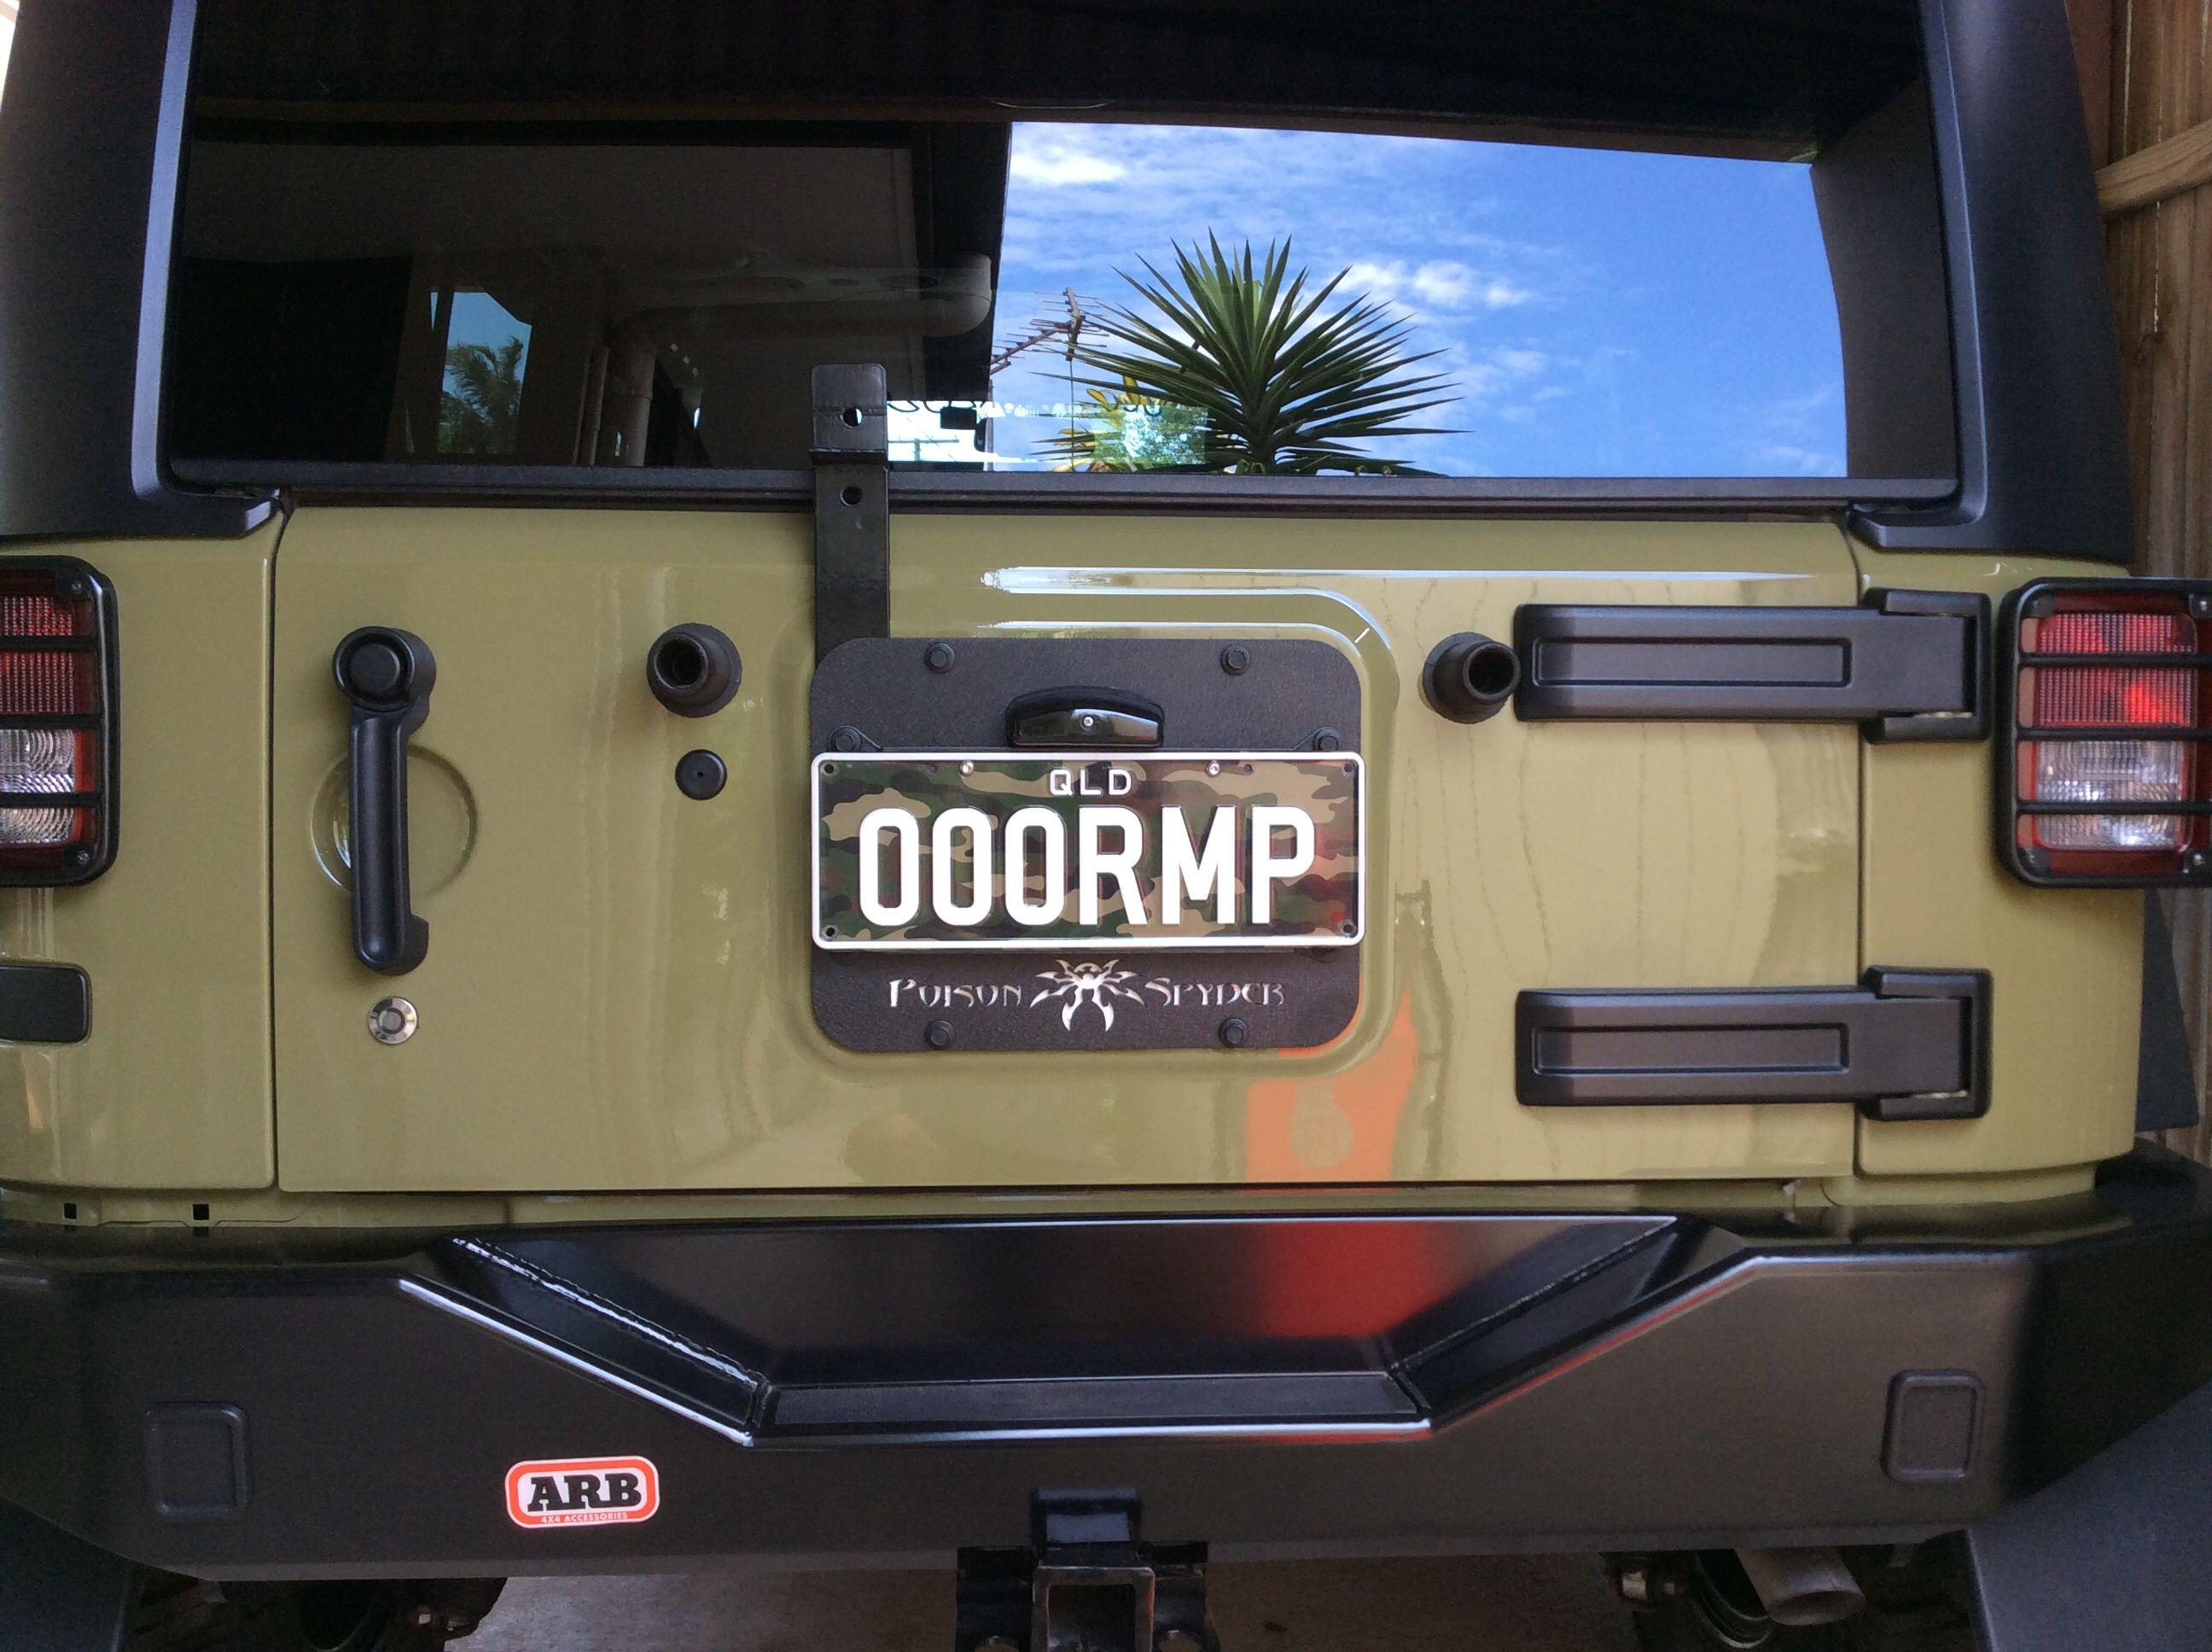 Poison Spyder Tramp Stamp Gas Grill Green Goblin Jeep Jk